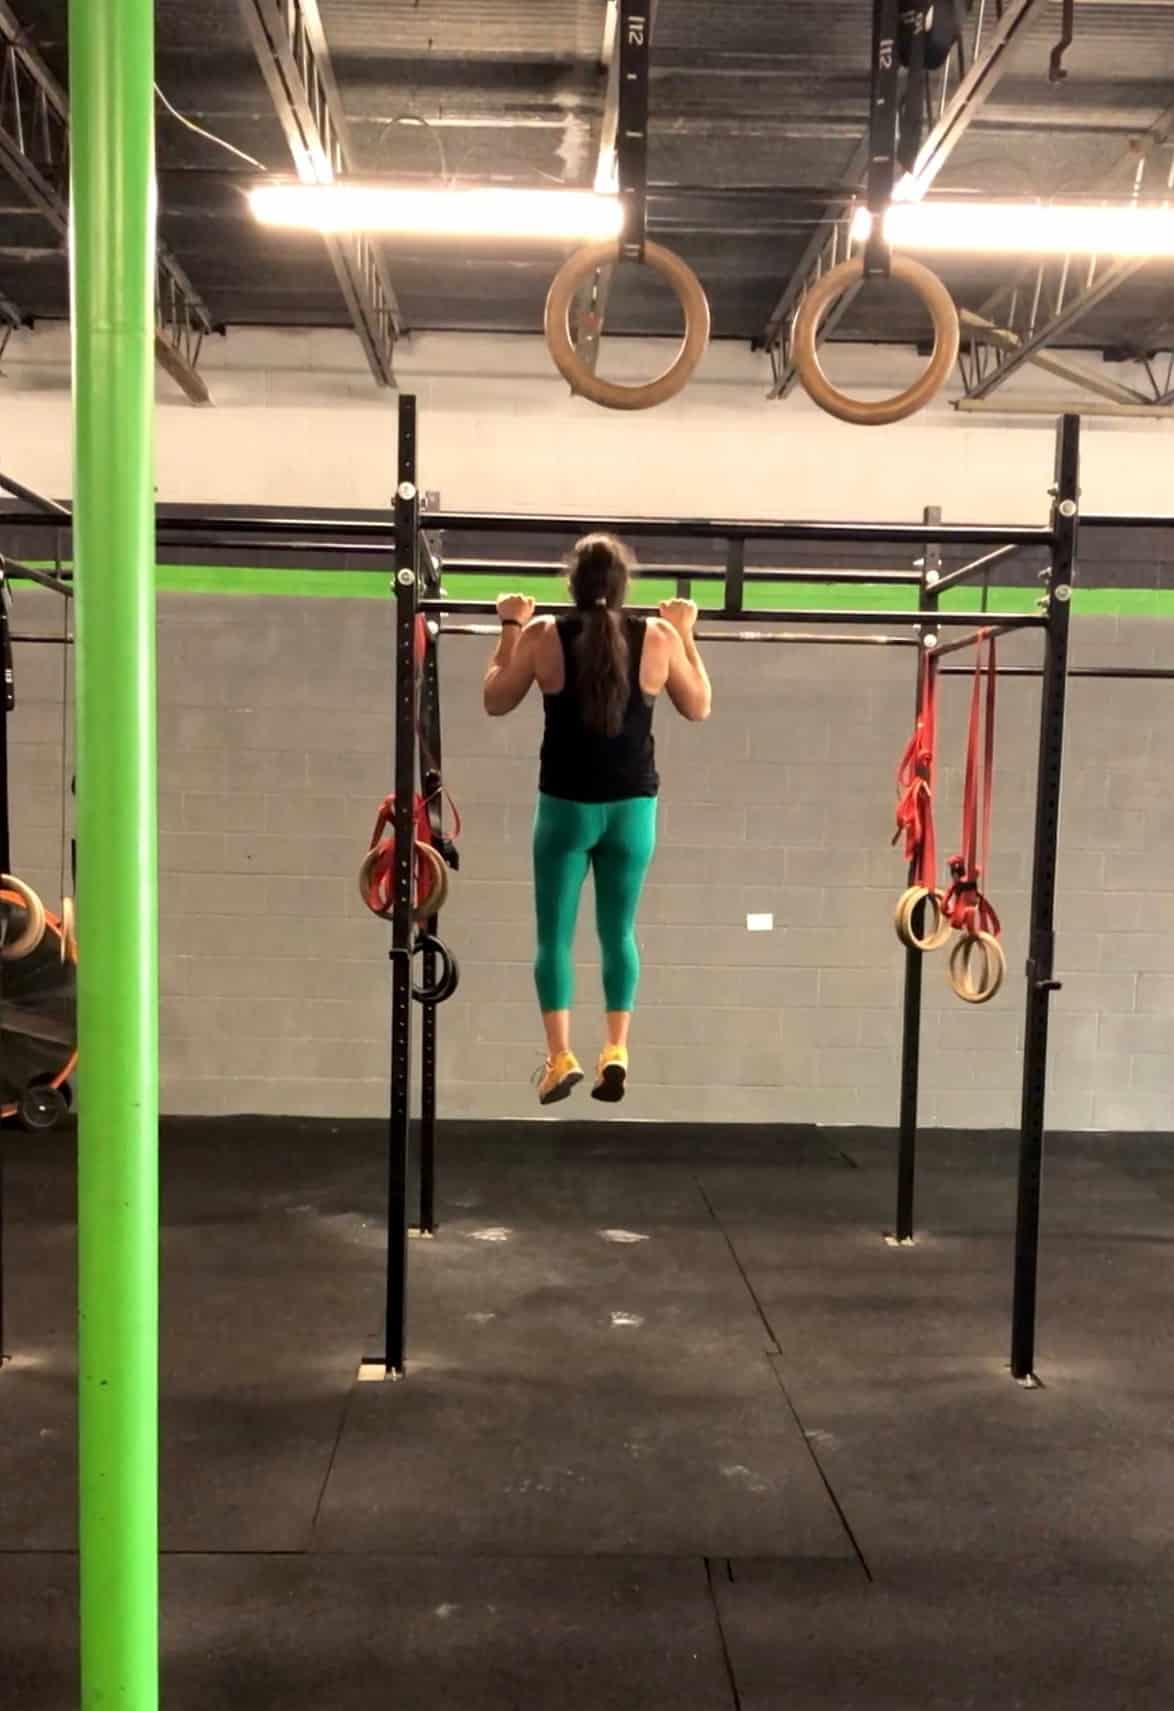 Girl in green leggings doing a strict pull-up